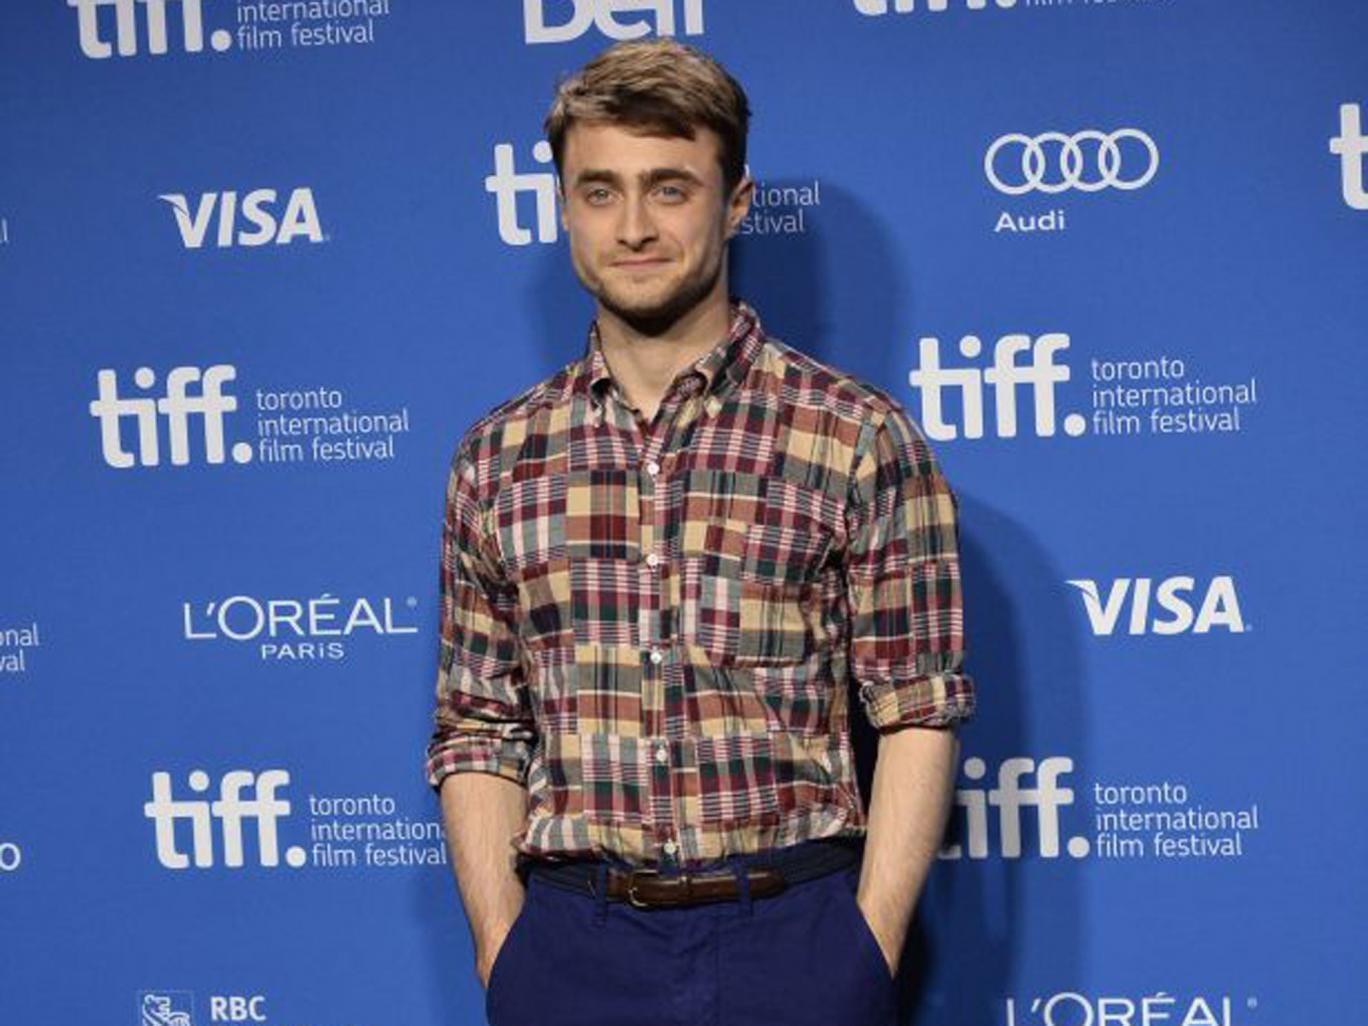 Daniel Radcliffe, Actor